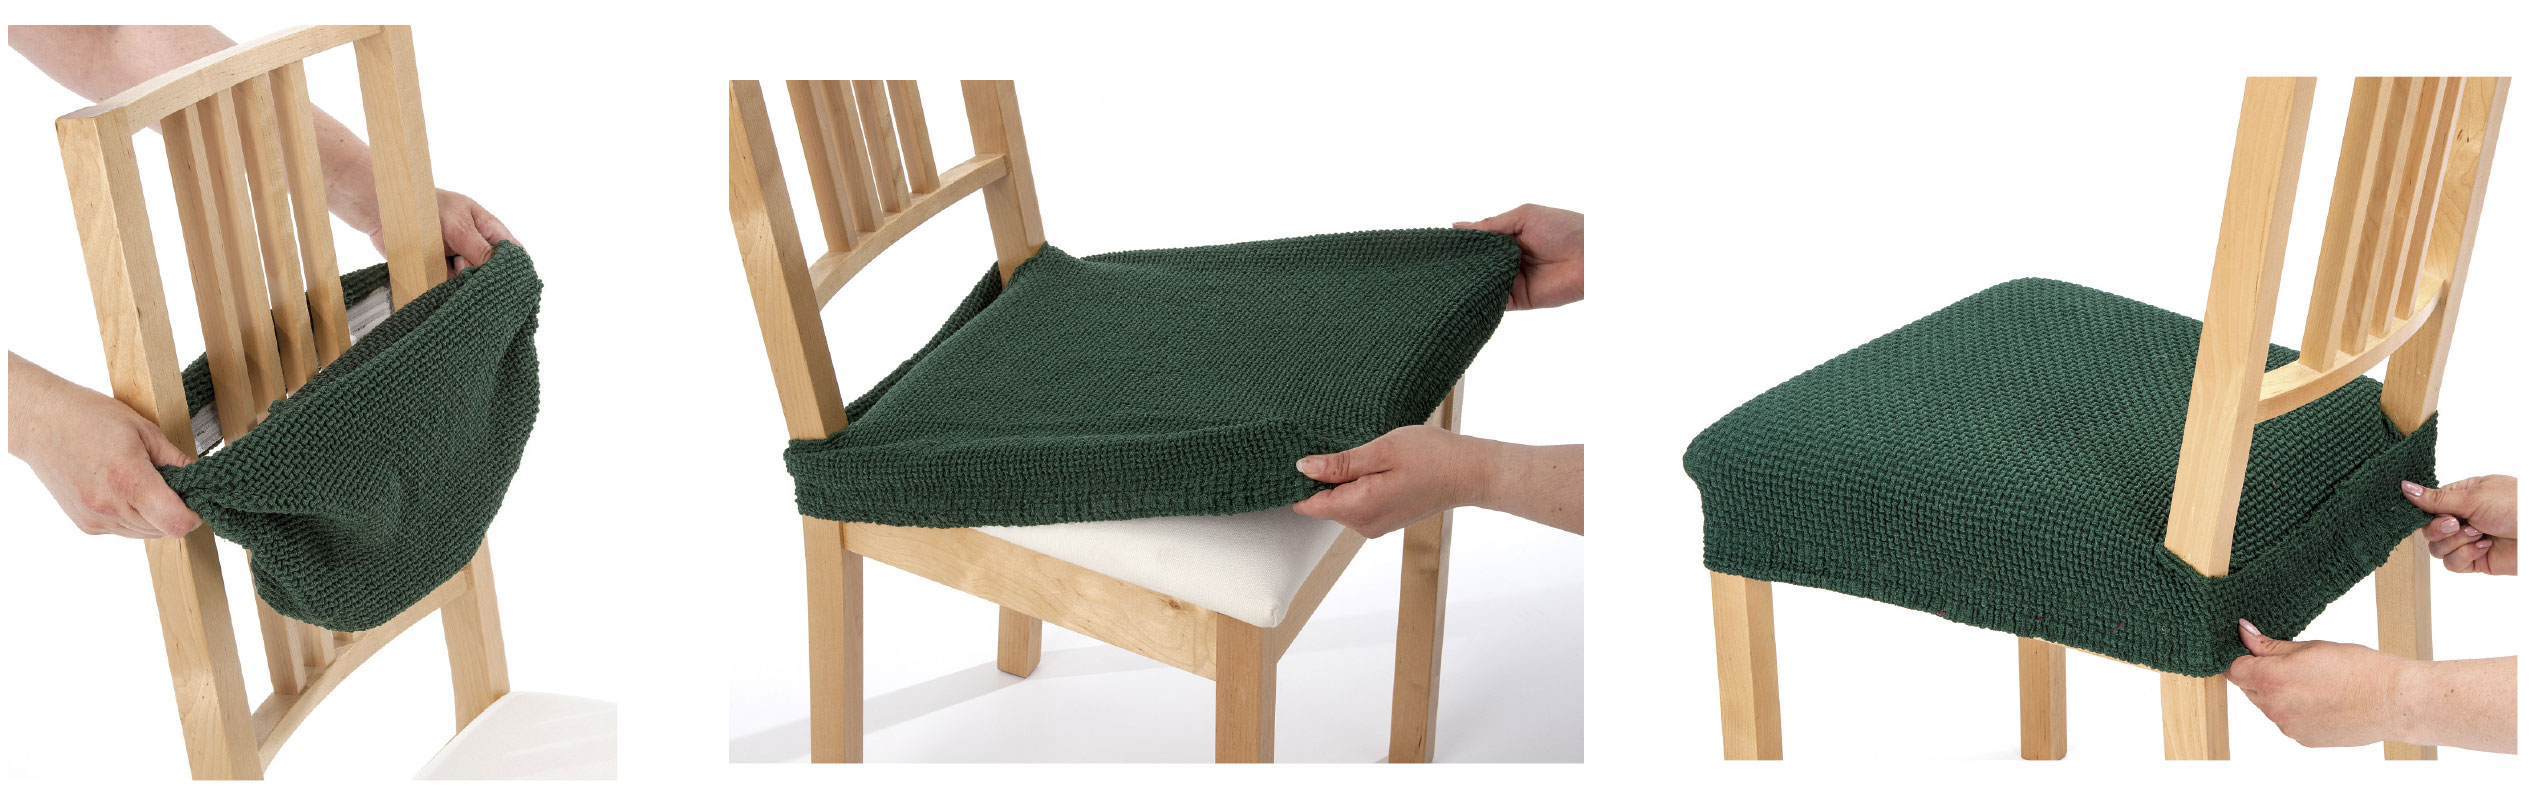 Colocacion-silla-con-respal.jpg